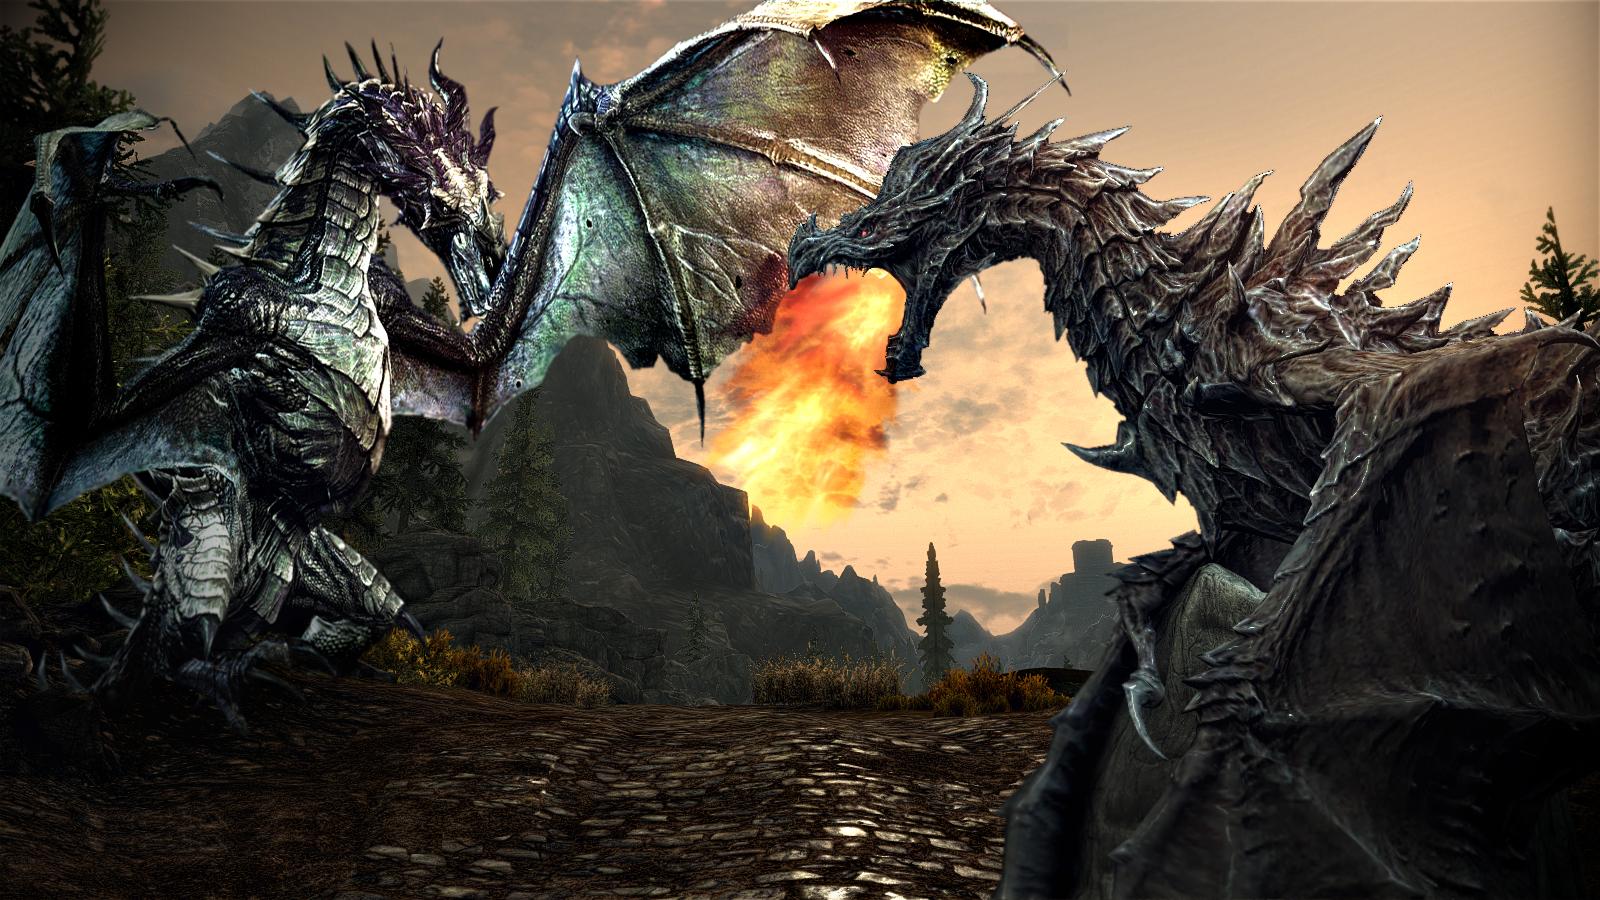 Download Dragoons Skyrim Wallpaper HD at Skyrim Nexus mods and